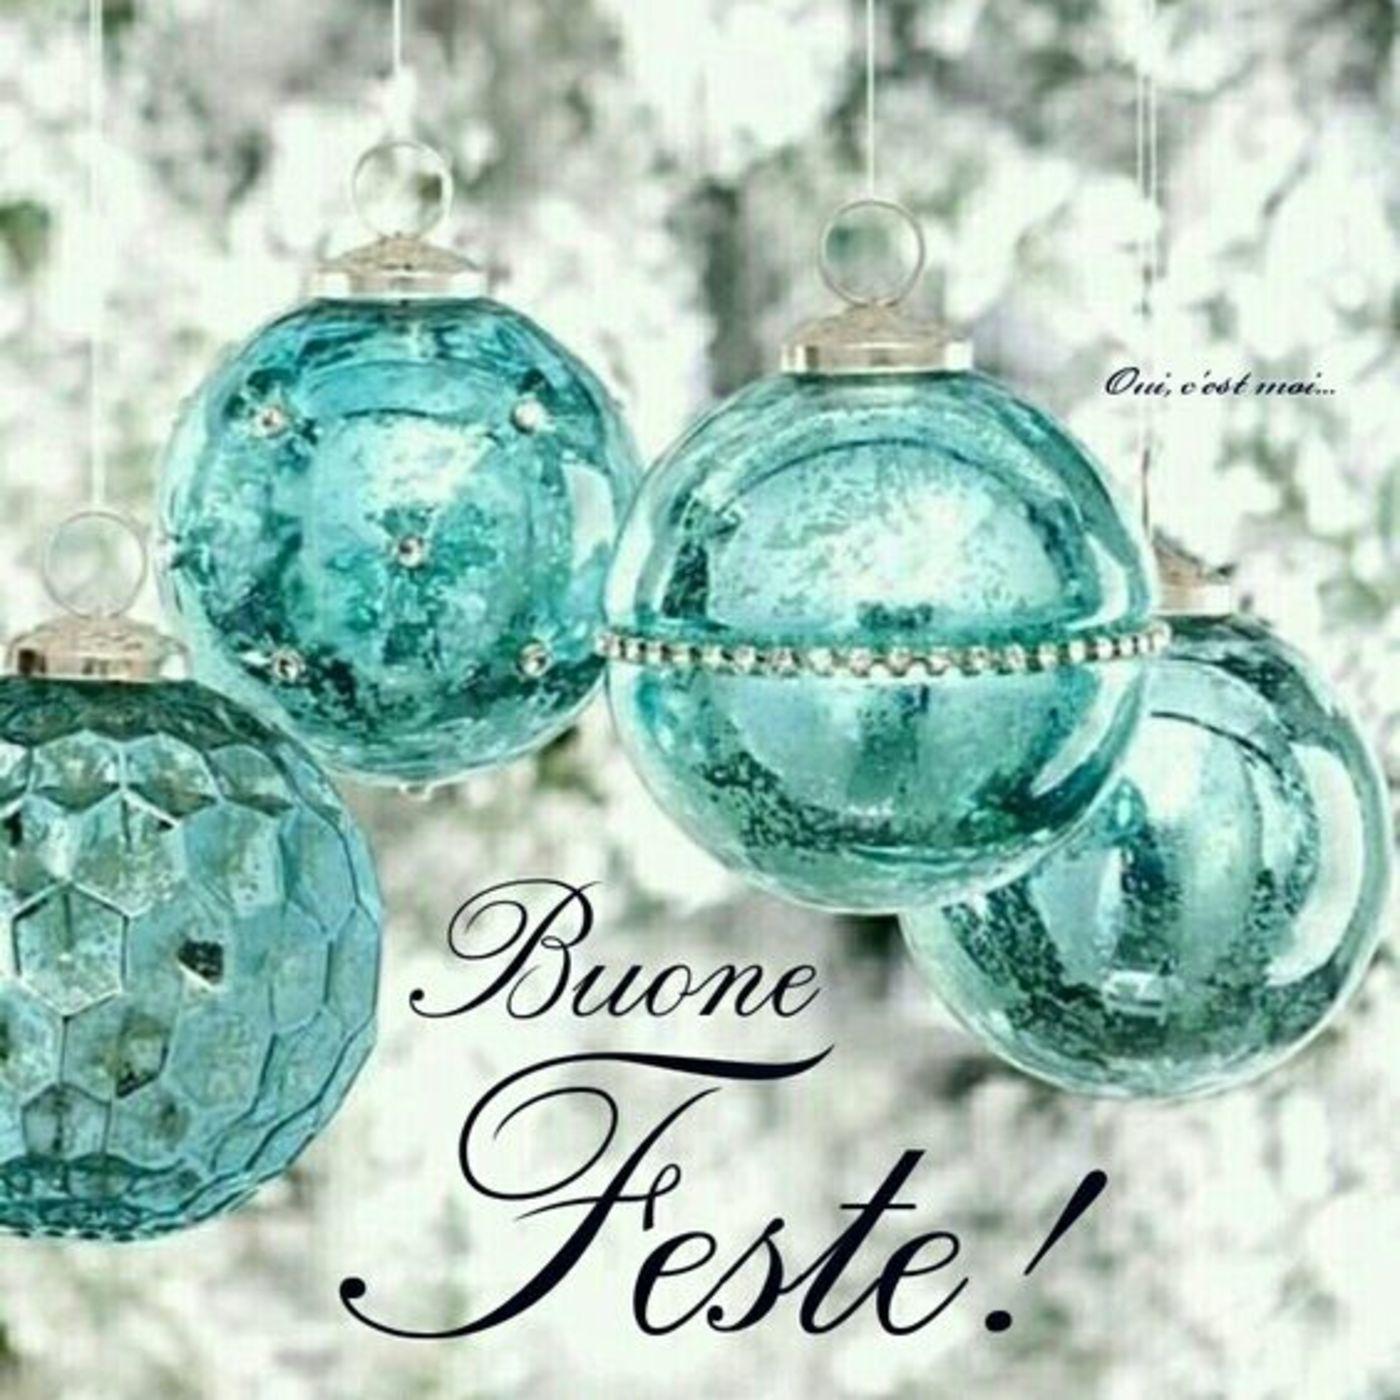 Buon Natale Shabby Chic.Auguri Di Buon Natale 2685 Turquoise Christmas Pink Christmas Christmas Wonderland